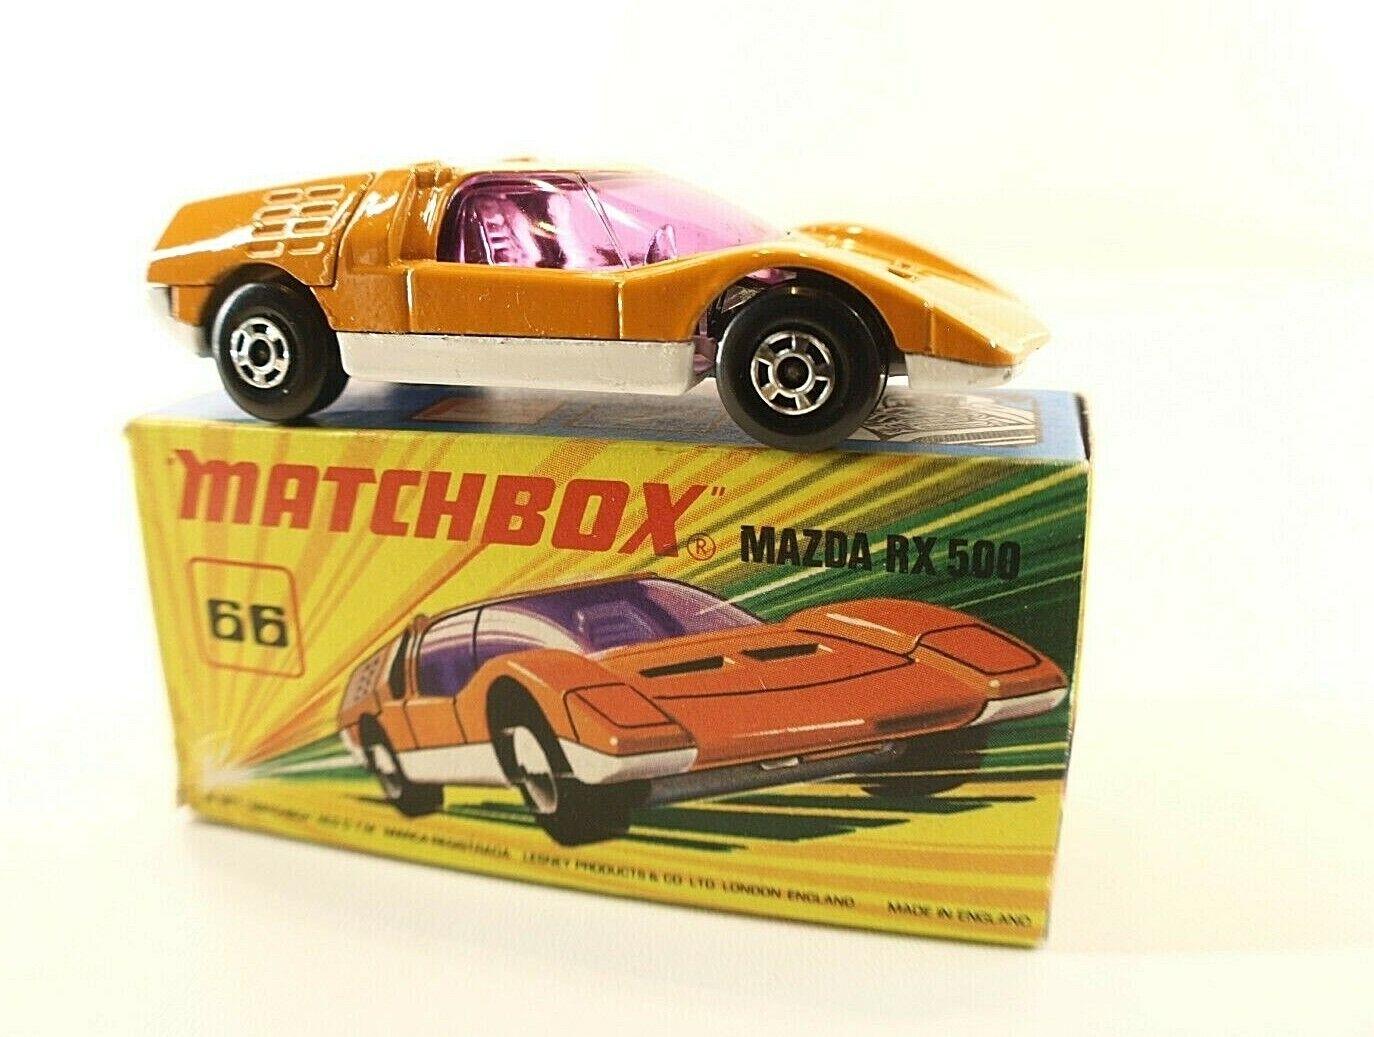 MatchBox Superfast New N° 66 Mazda RX500 neuf en boite MIB 1974